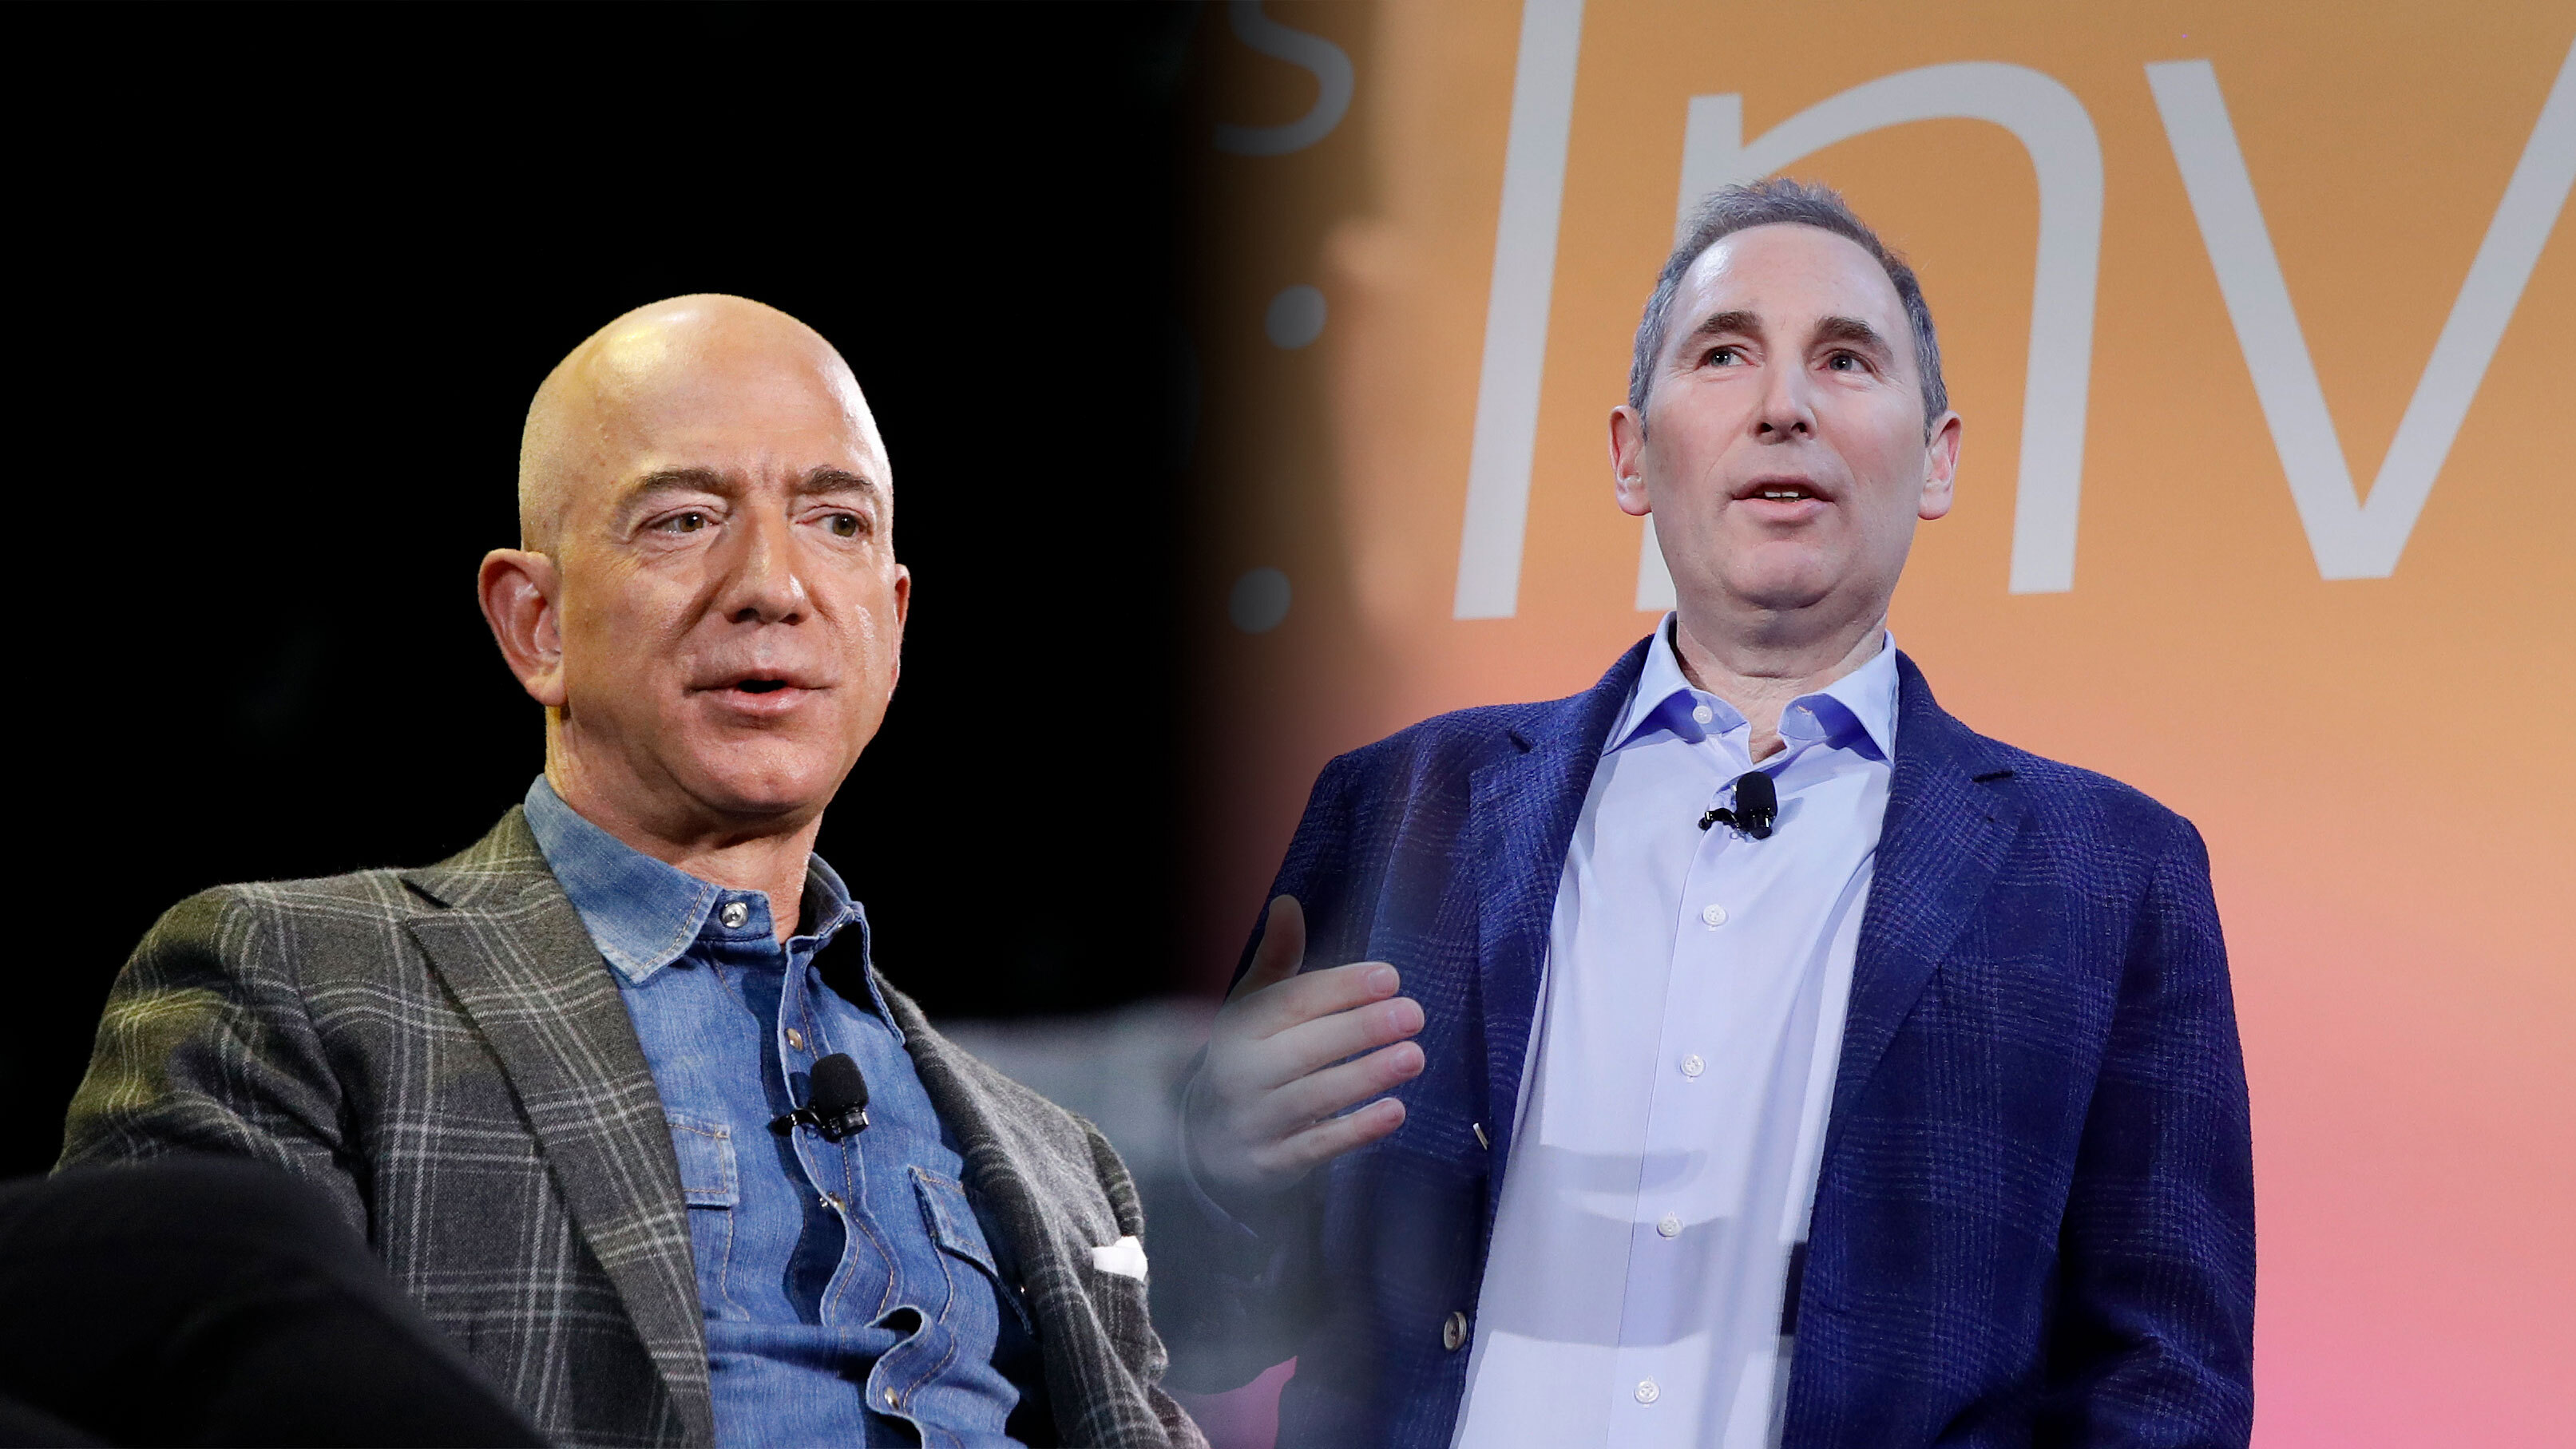 Jeff Bezos, executive chairman and Andy Jassy, CEO at Amazon